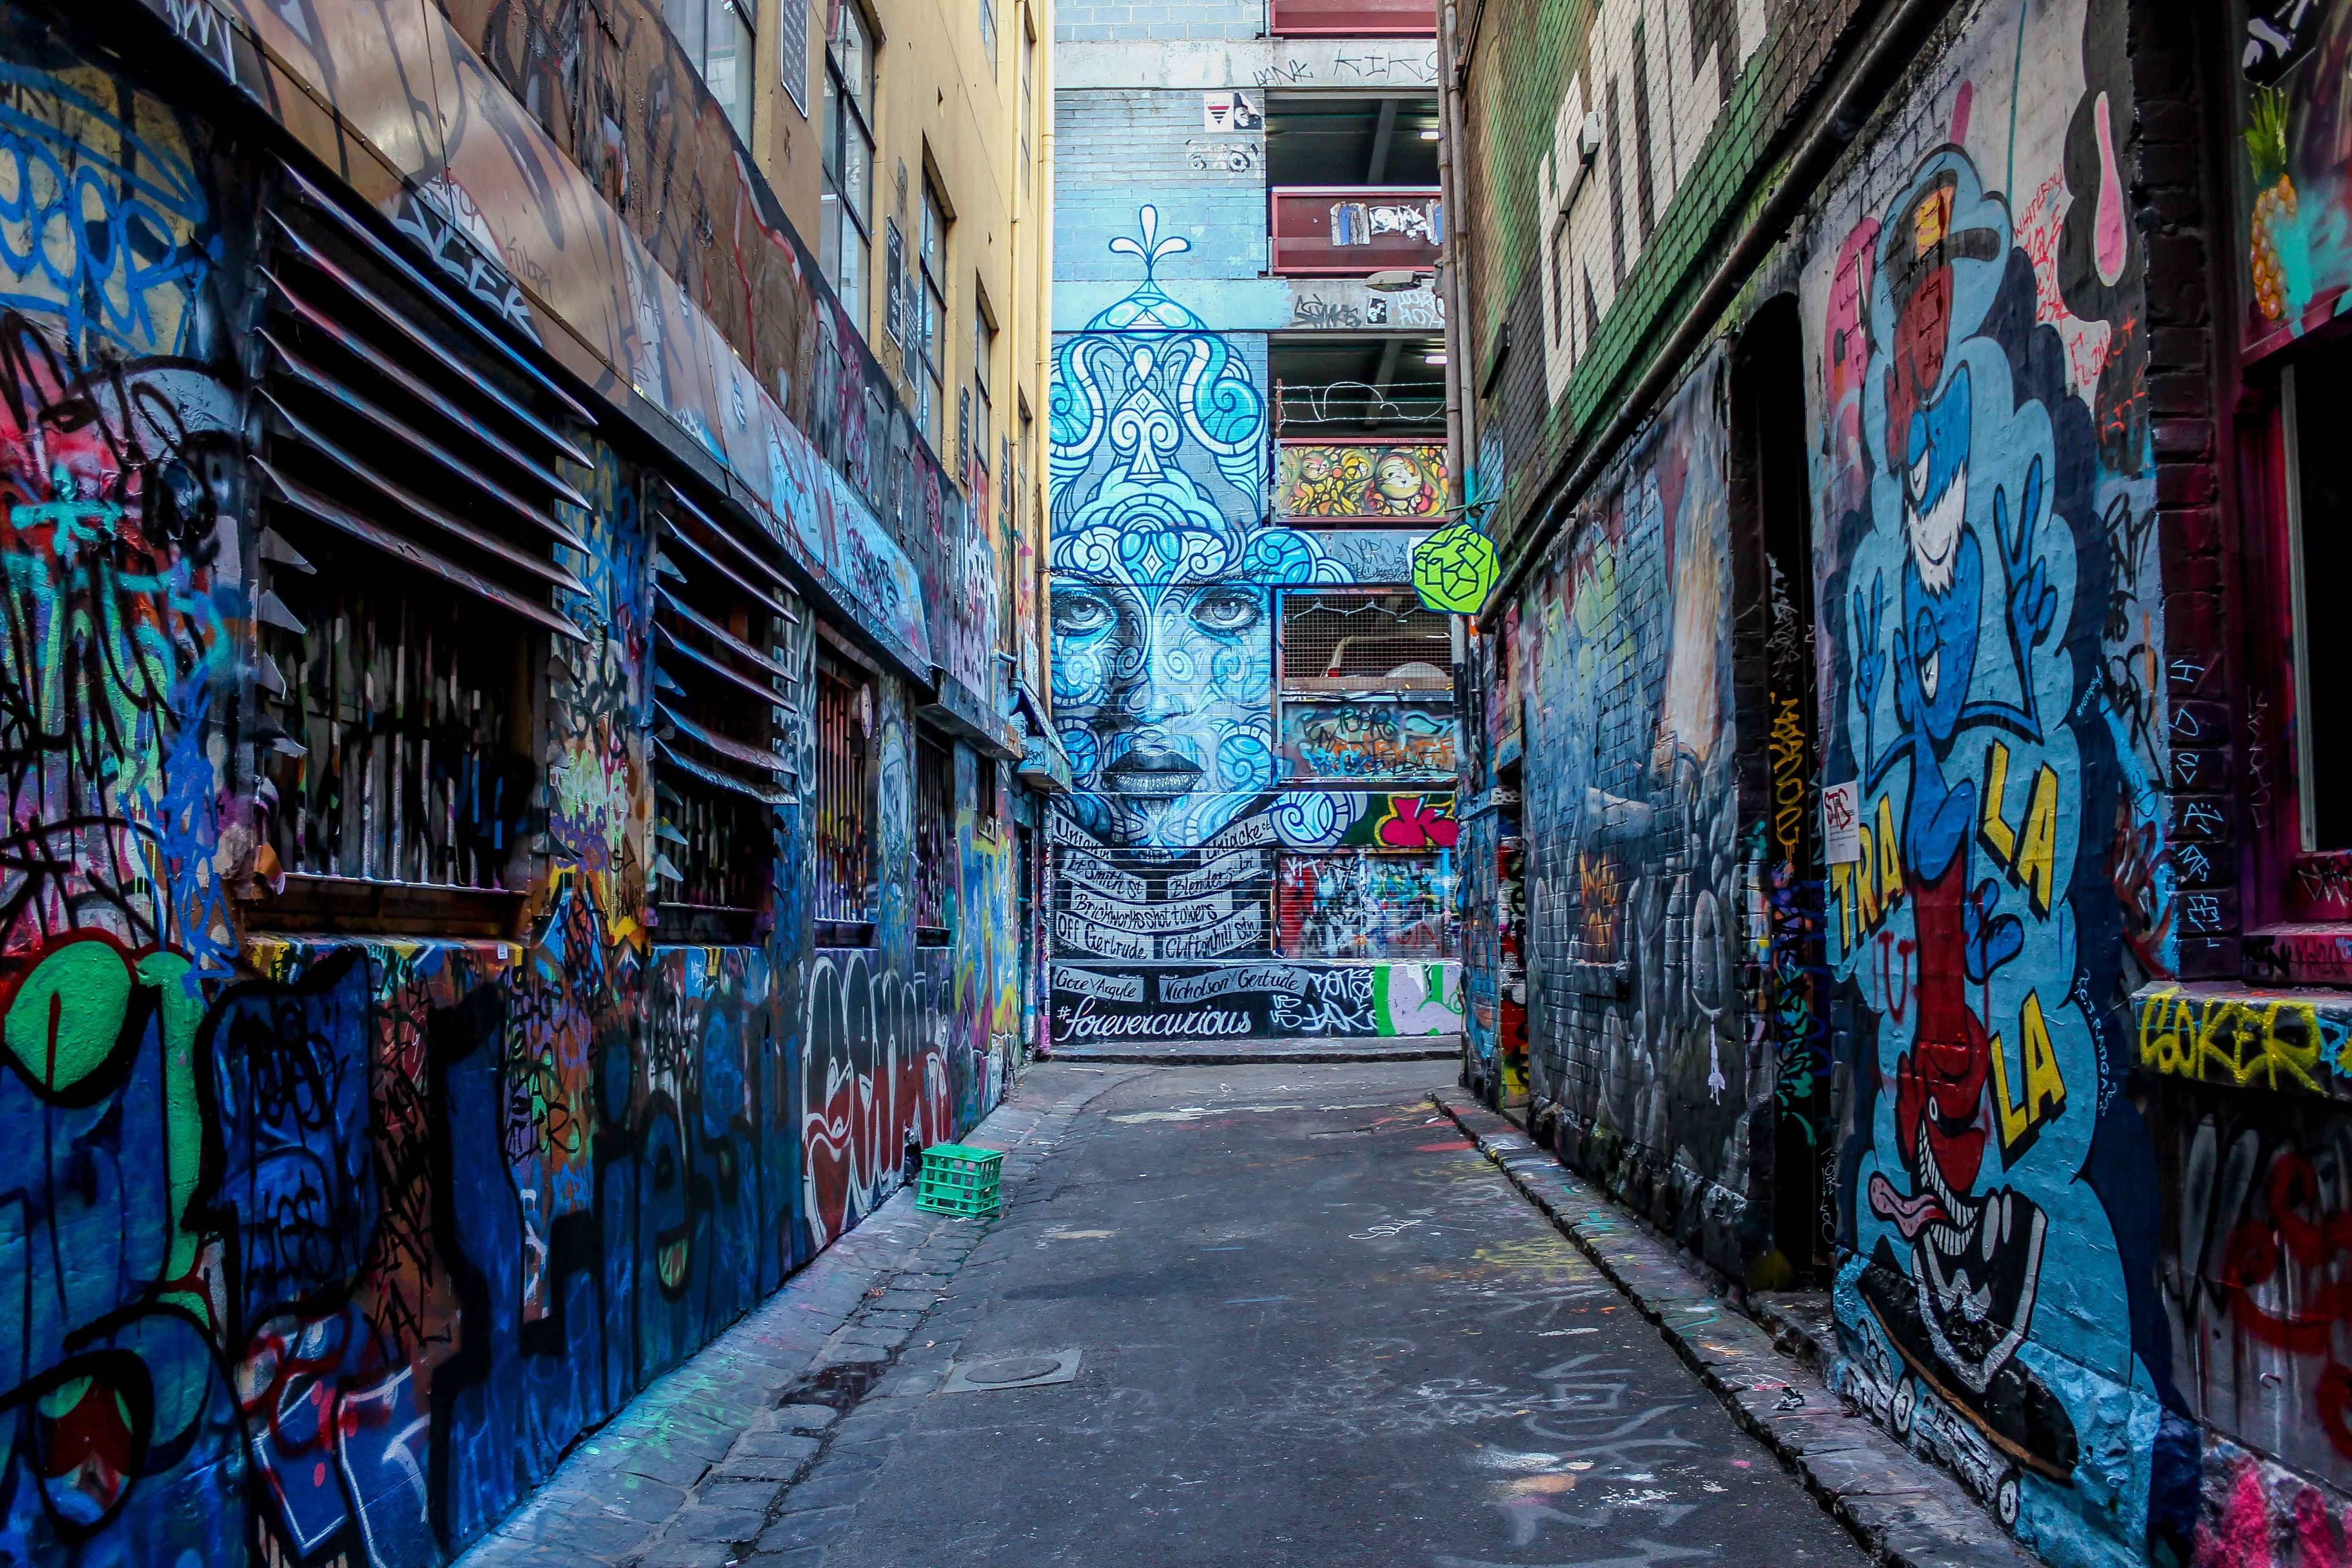 Картинки граффити лучшие